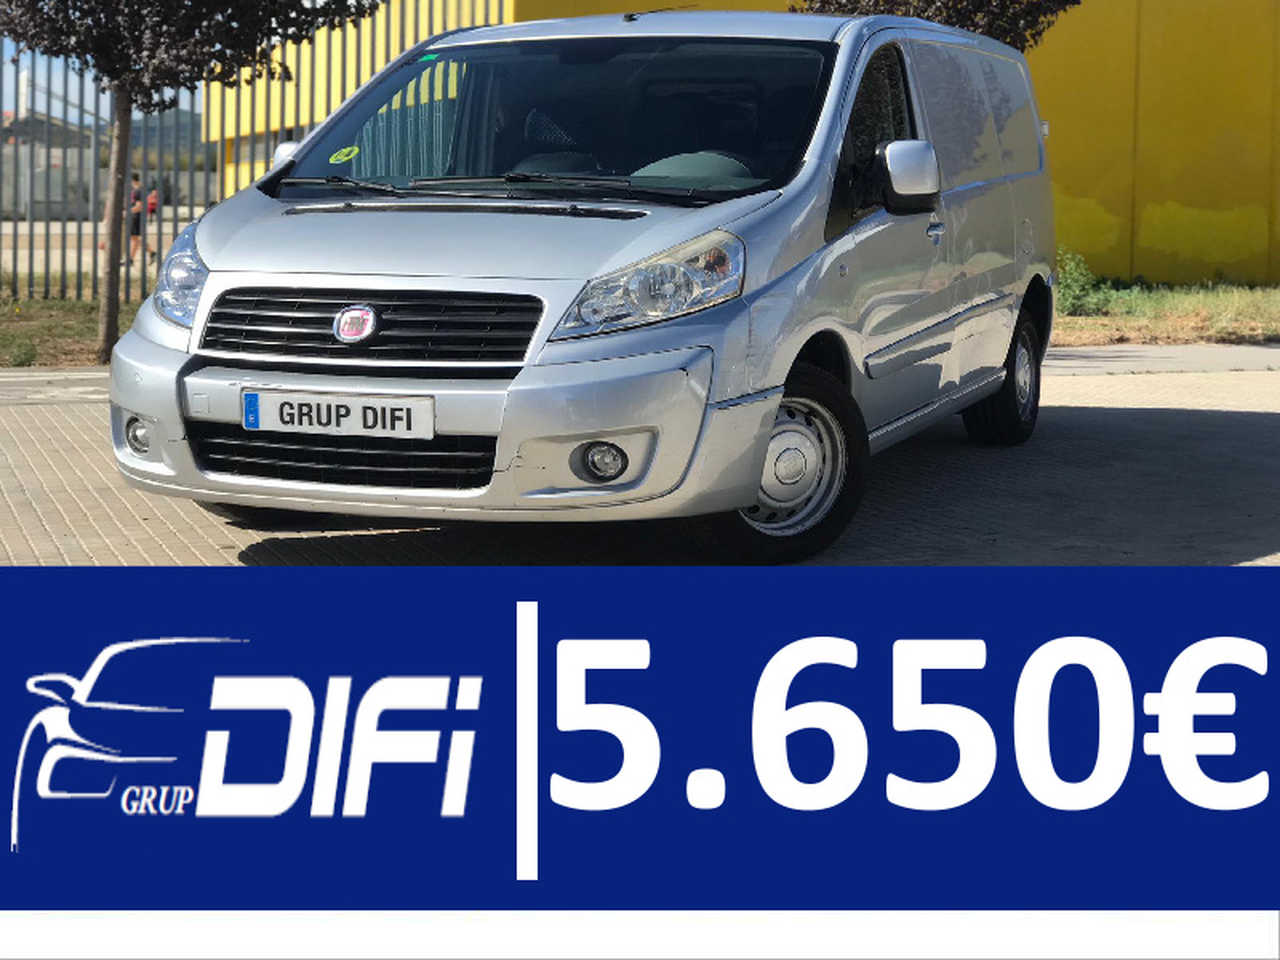 Fiat Scudo Furgon 2.0 MJT 120cv H1 12 Comfort Largo ISOTERMO   - Foto 1